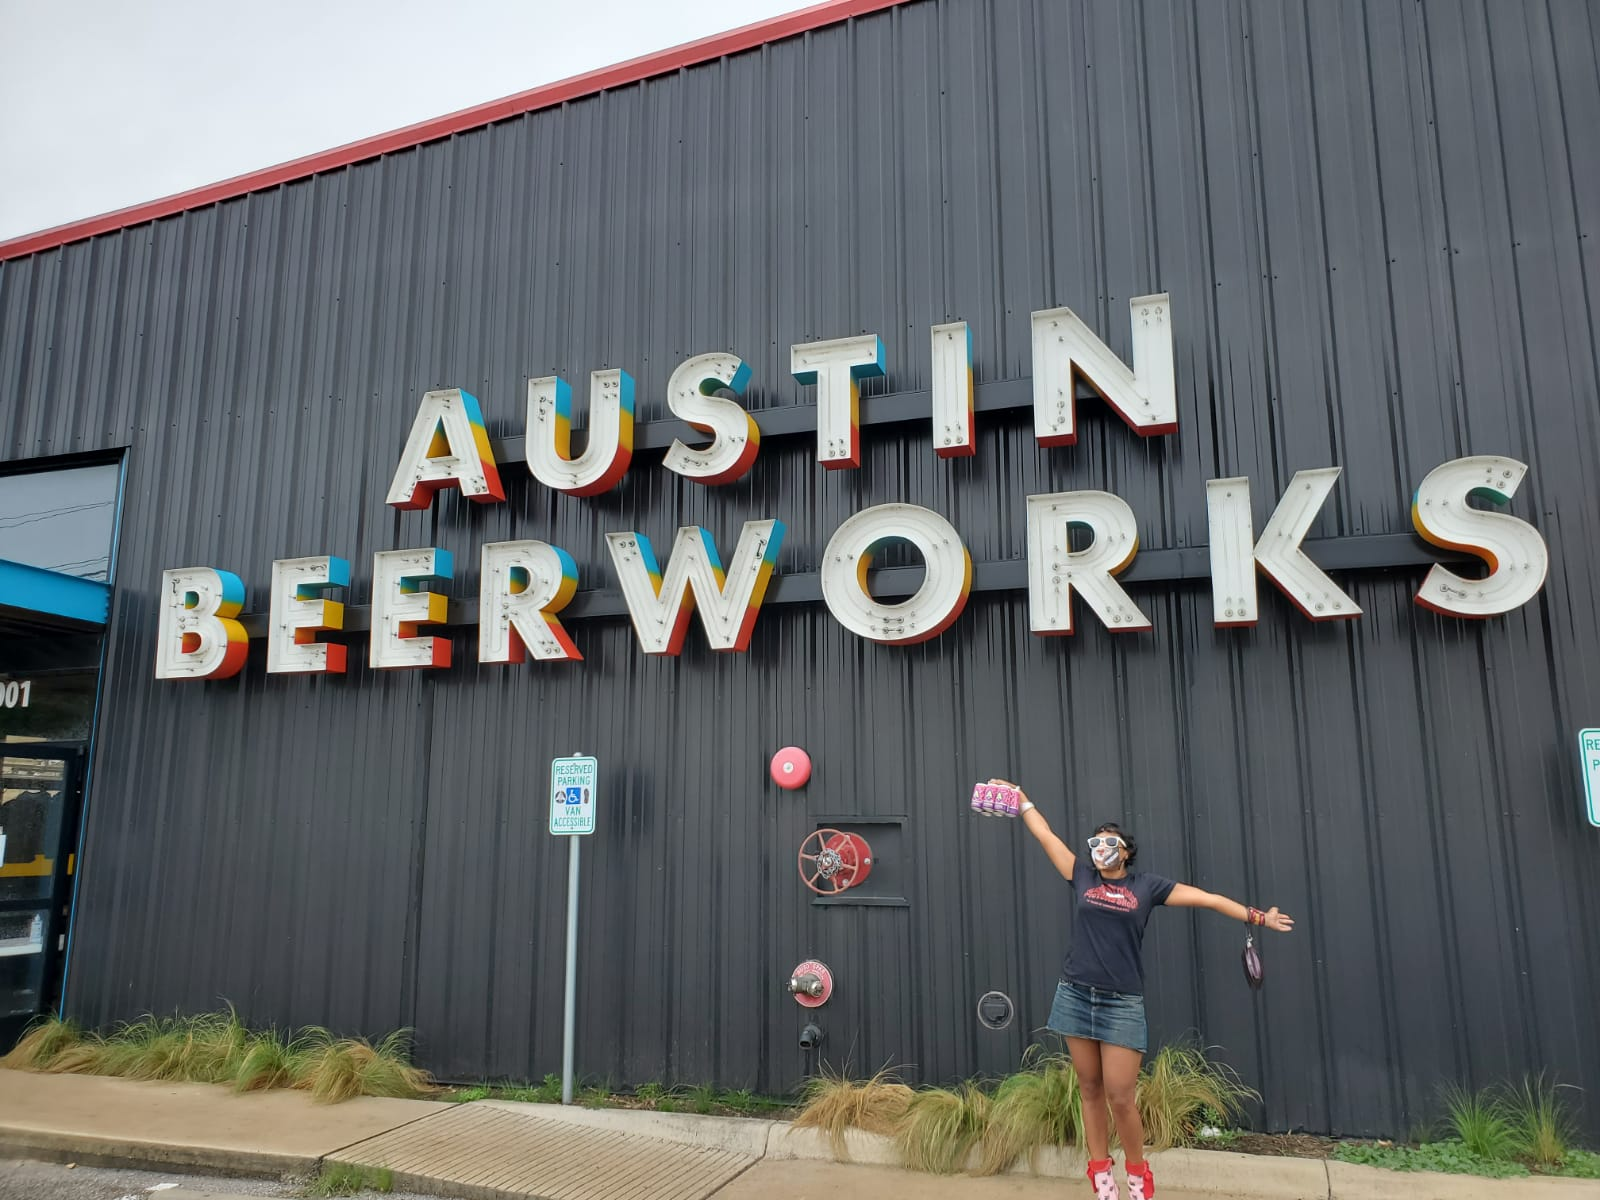 Austin Beerworks La Verdad Mexican Lager